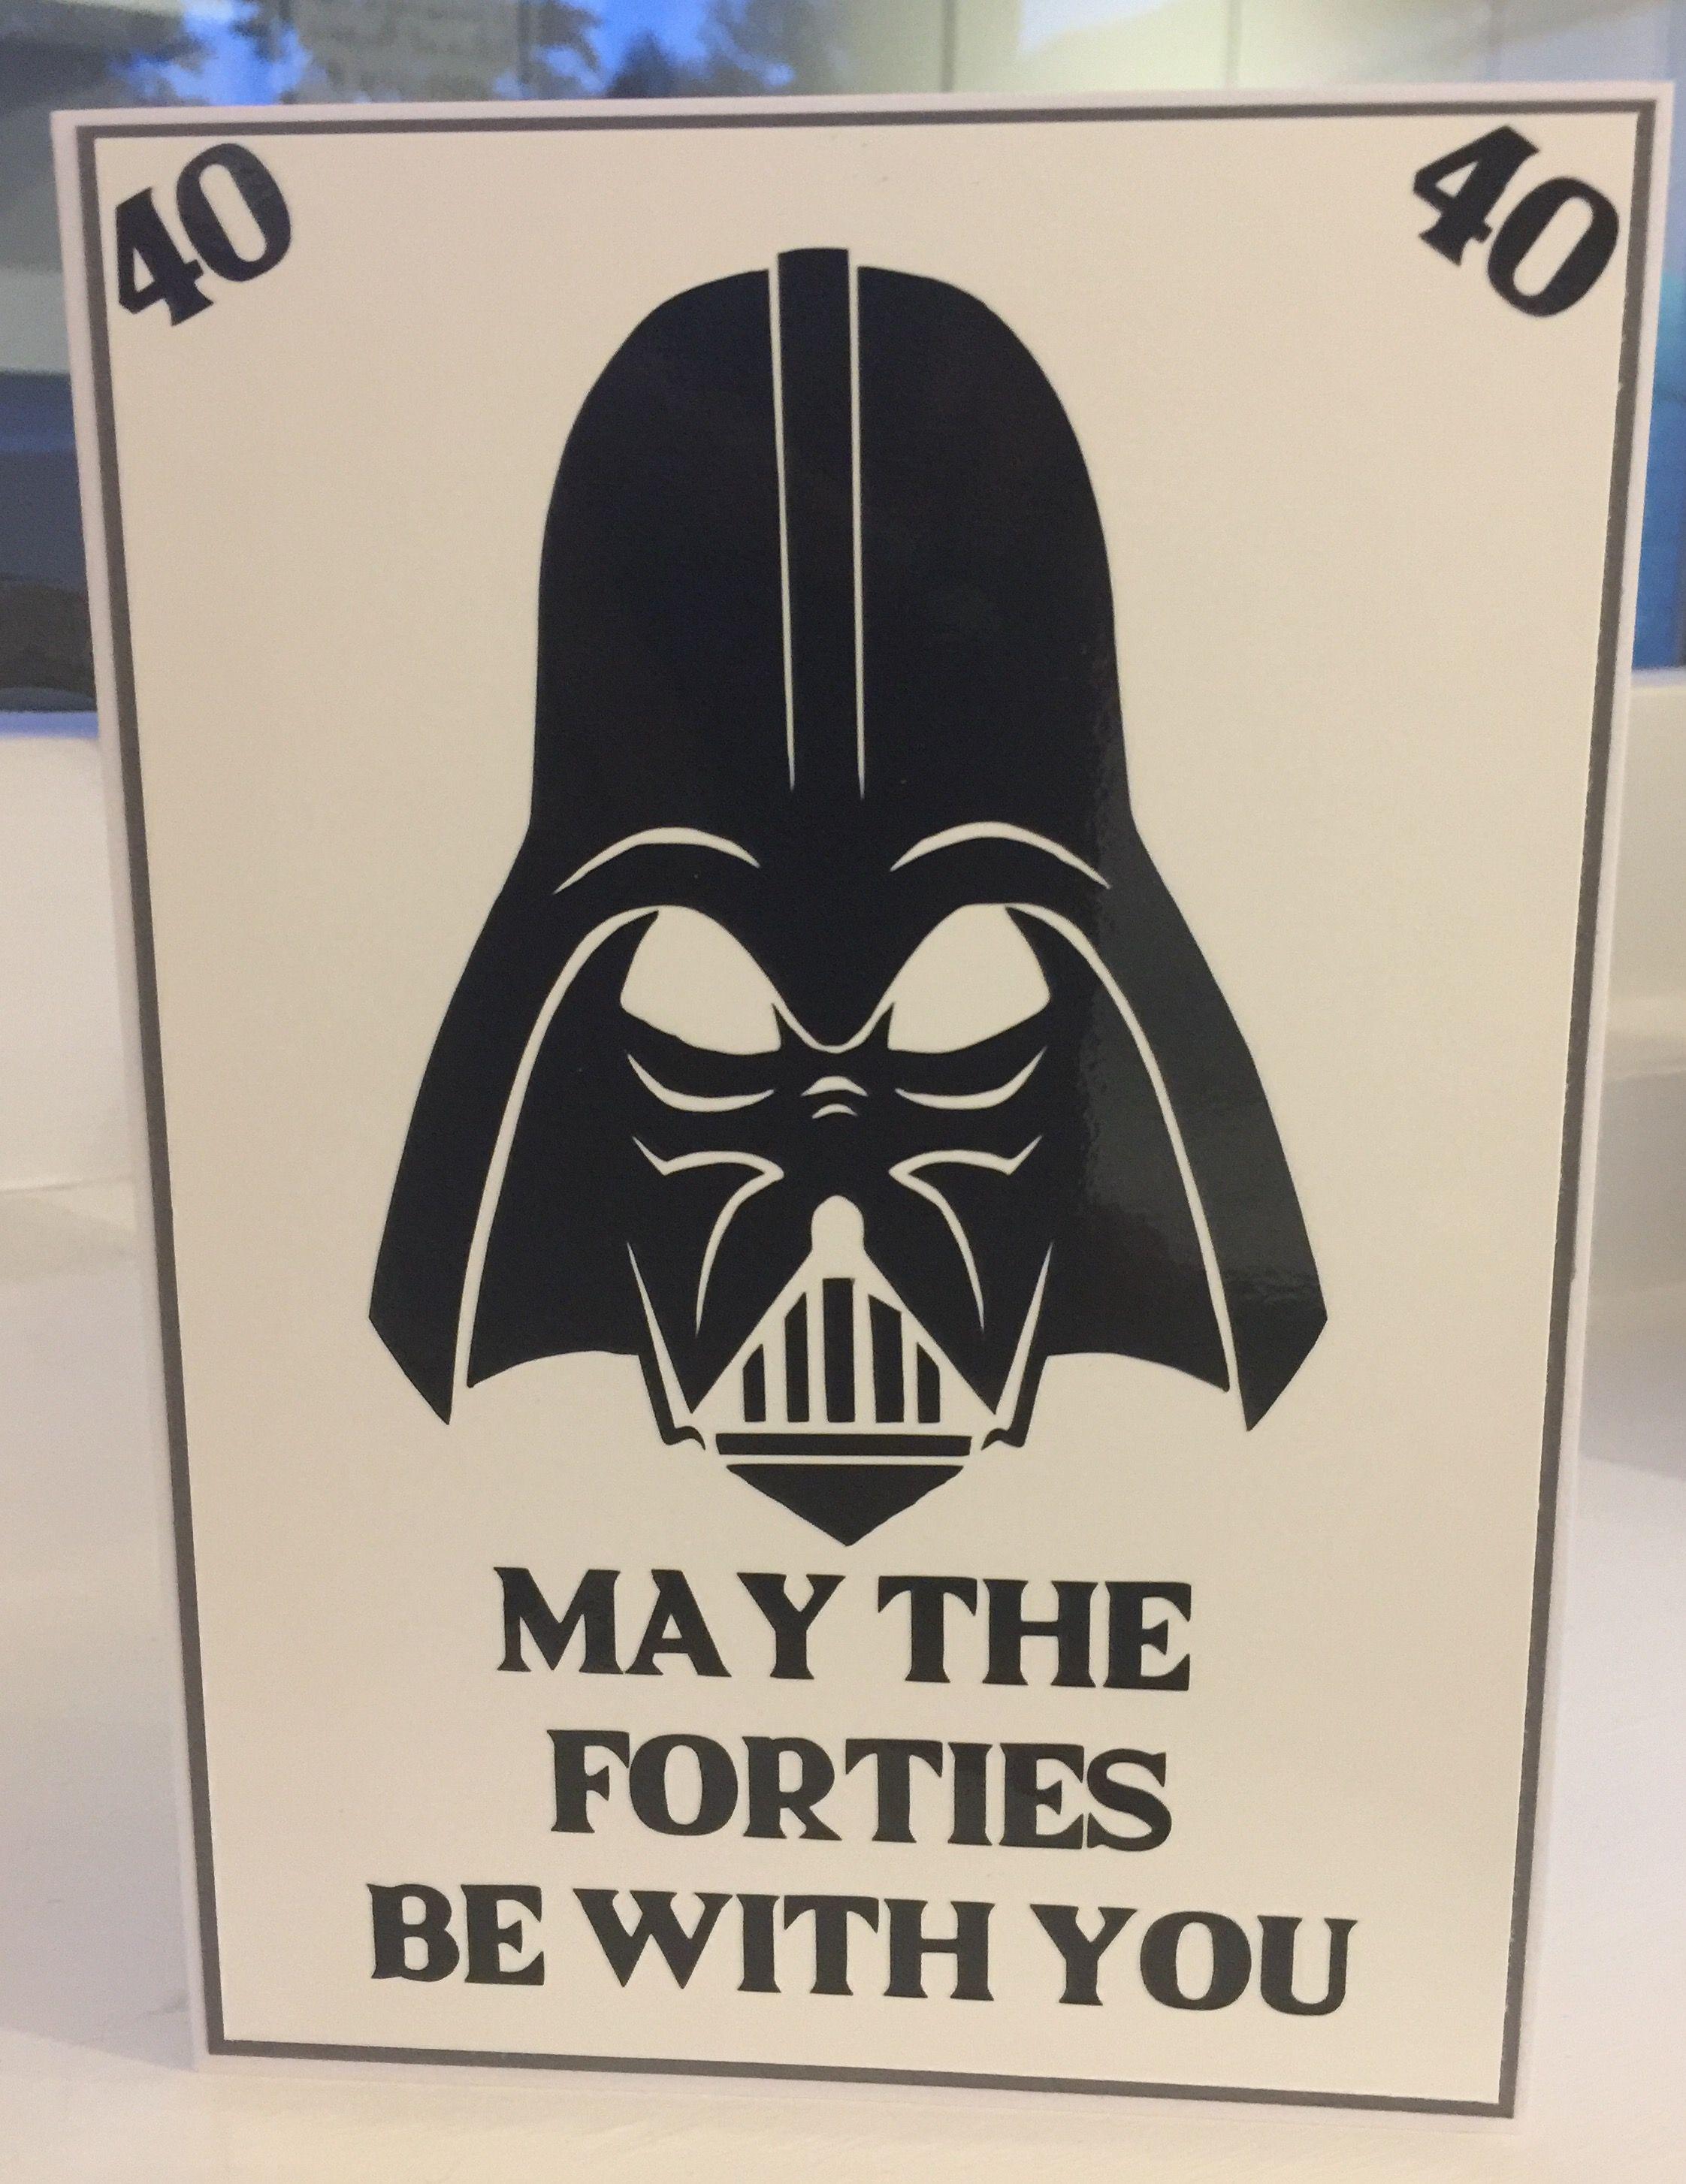 Star Wars Themed 40th Birthday Card 40th Birthday Cards Funny Birthday Cards Birthday Cards For Men